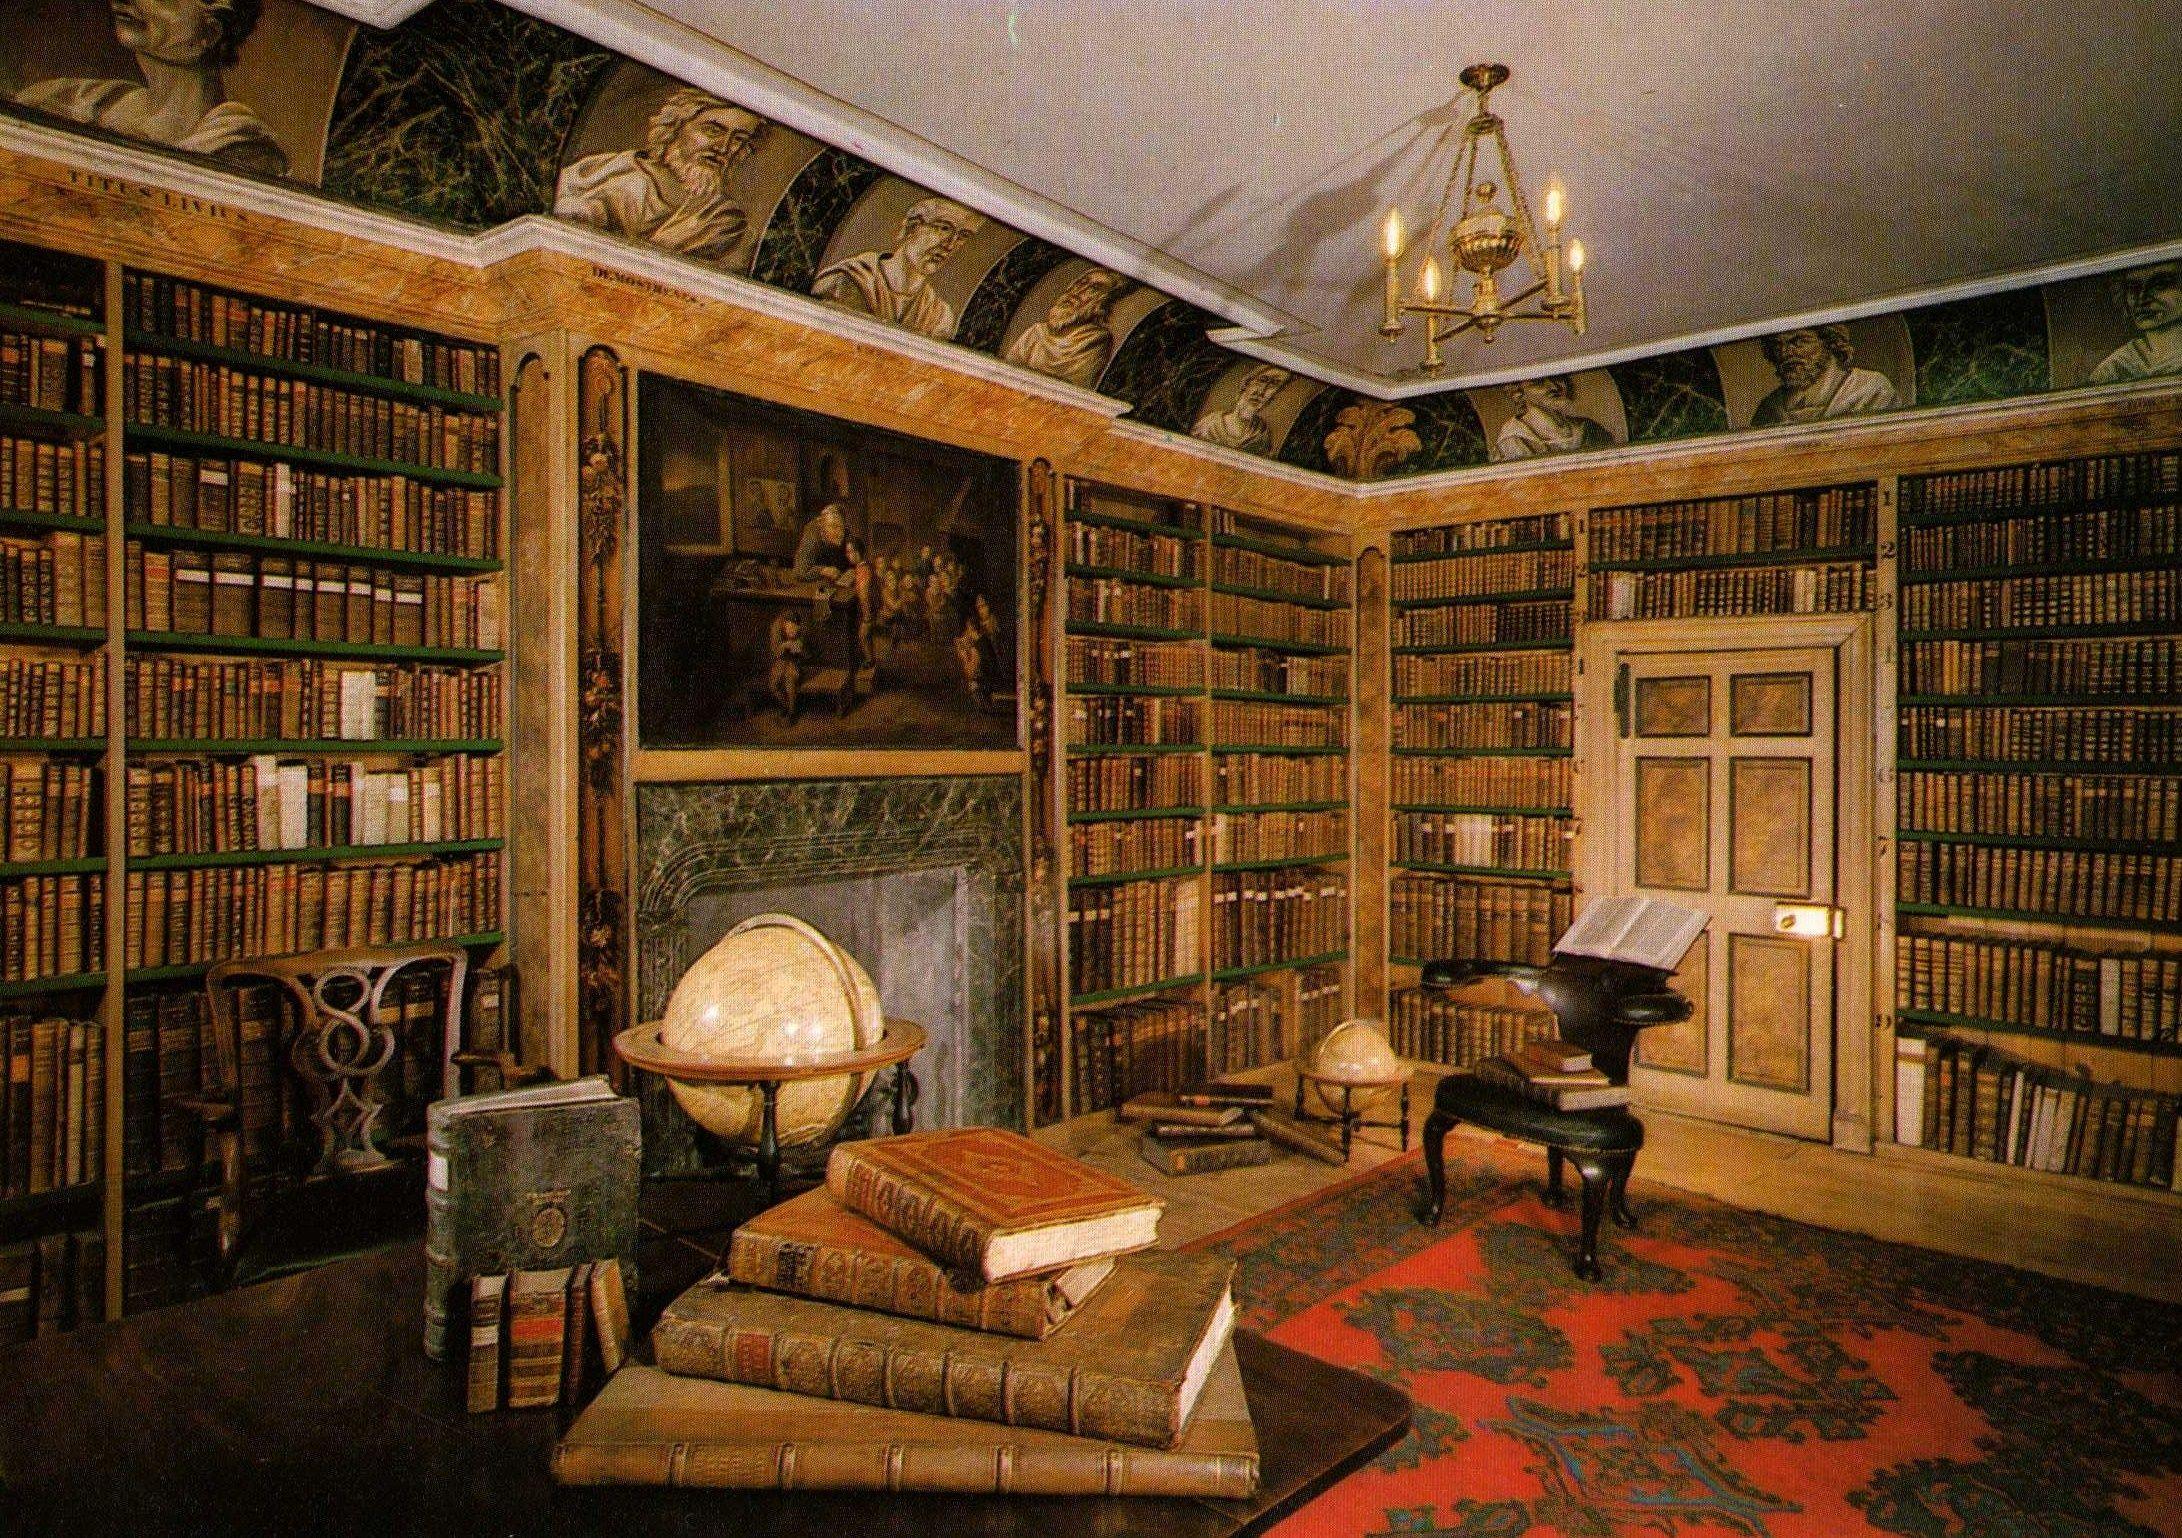 The Library - Traquair House - Peebleshire - Scotland